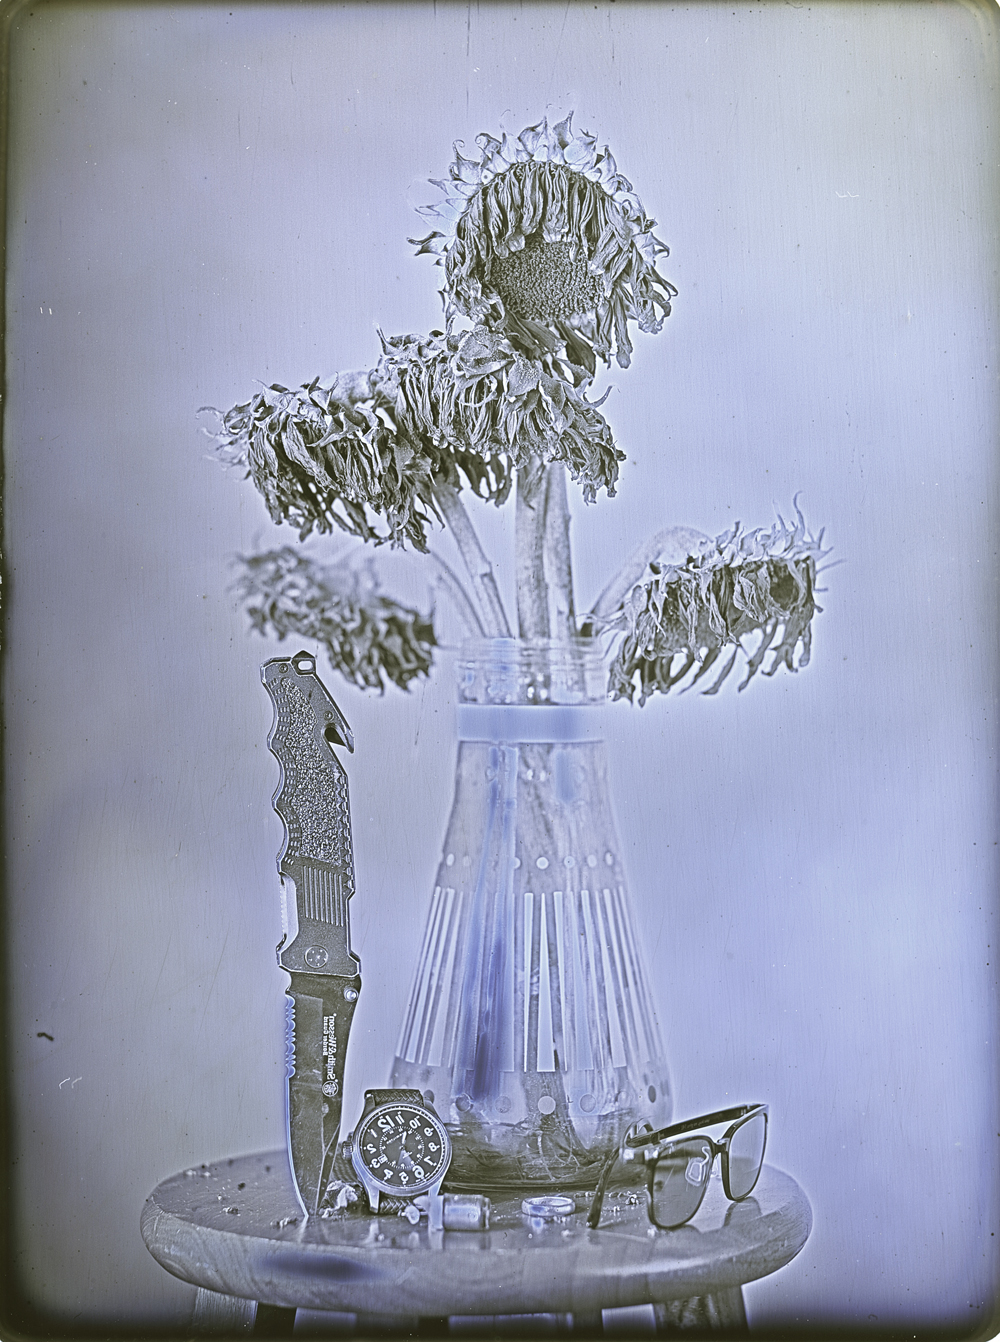 Daniel Carrillo, Personal Items, 2013, daguerreotype, 5.5 x 4.25 inches, $1200.